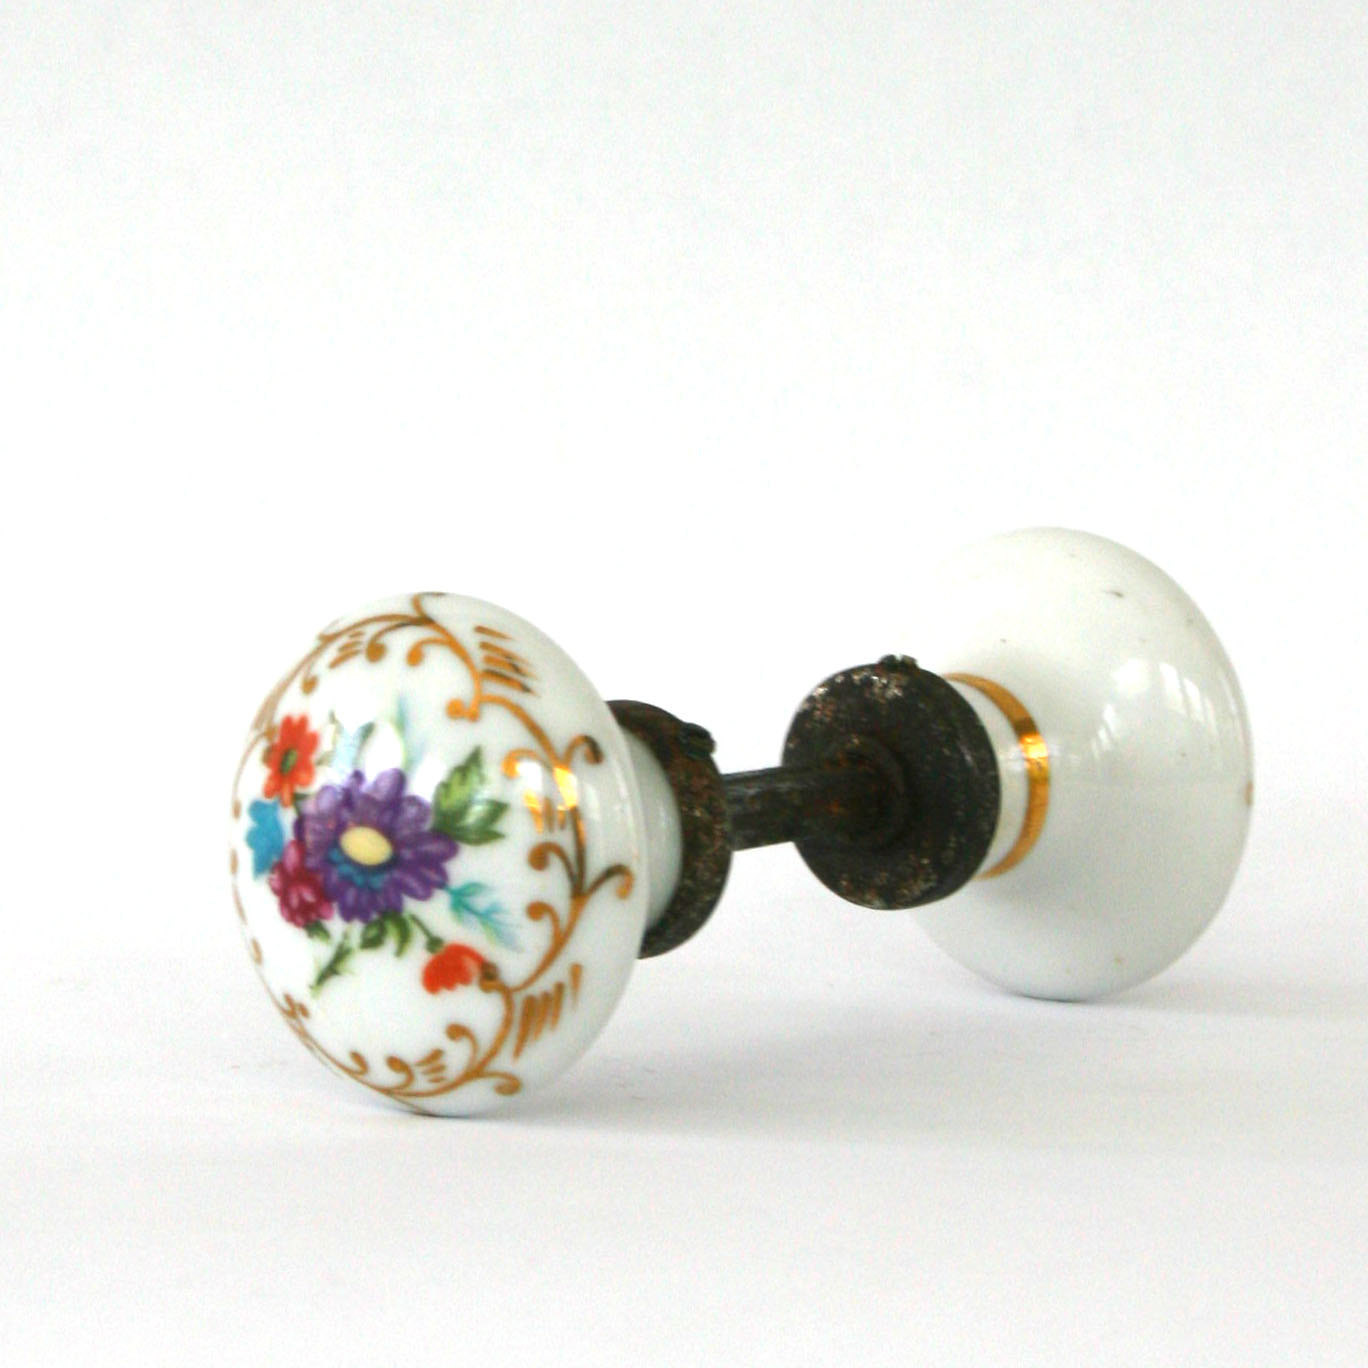 porcelain door knobs floral photo - 6